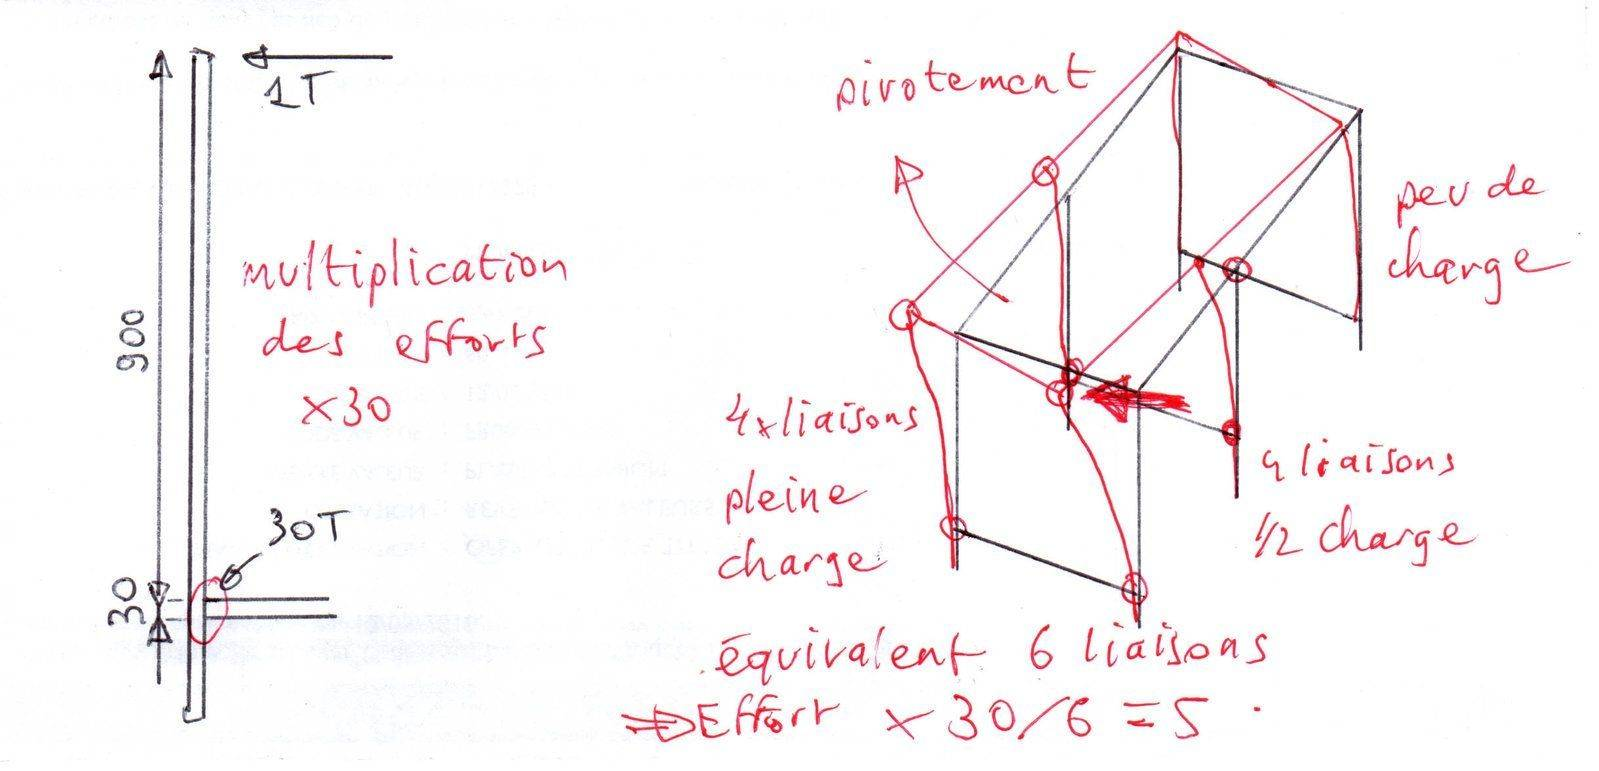 Déformation table FB29.jpg